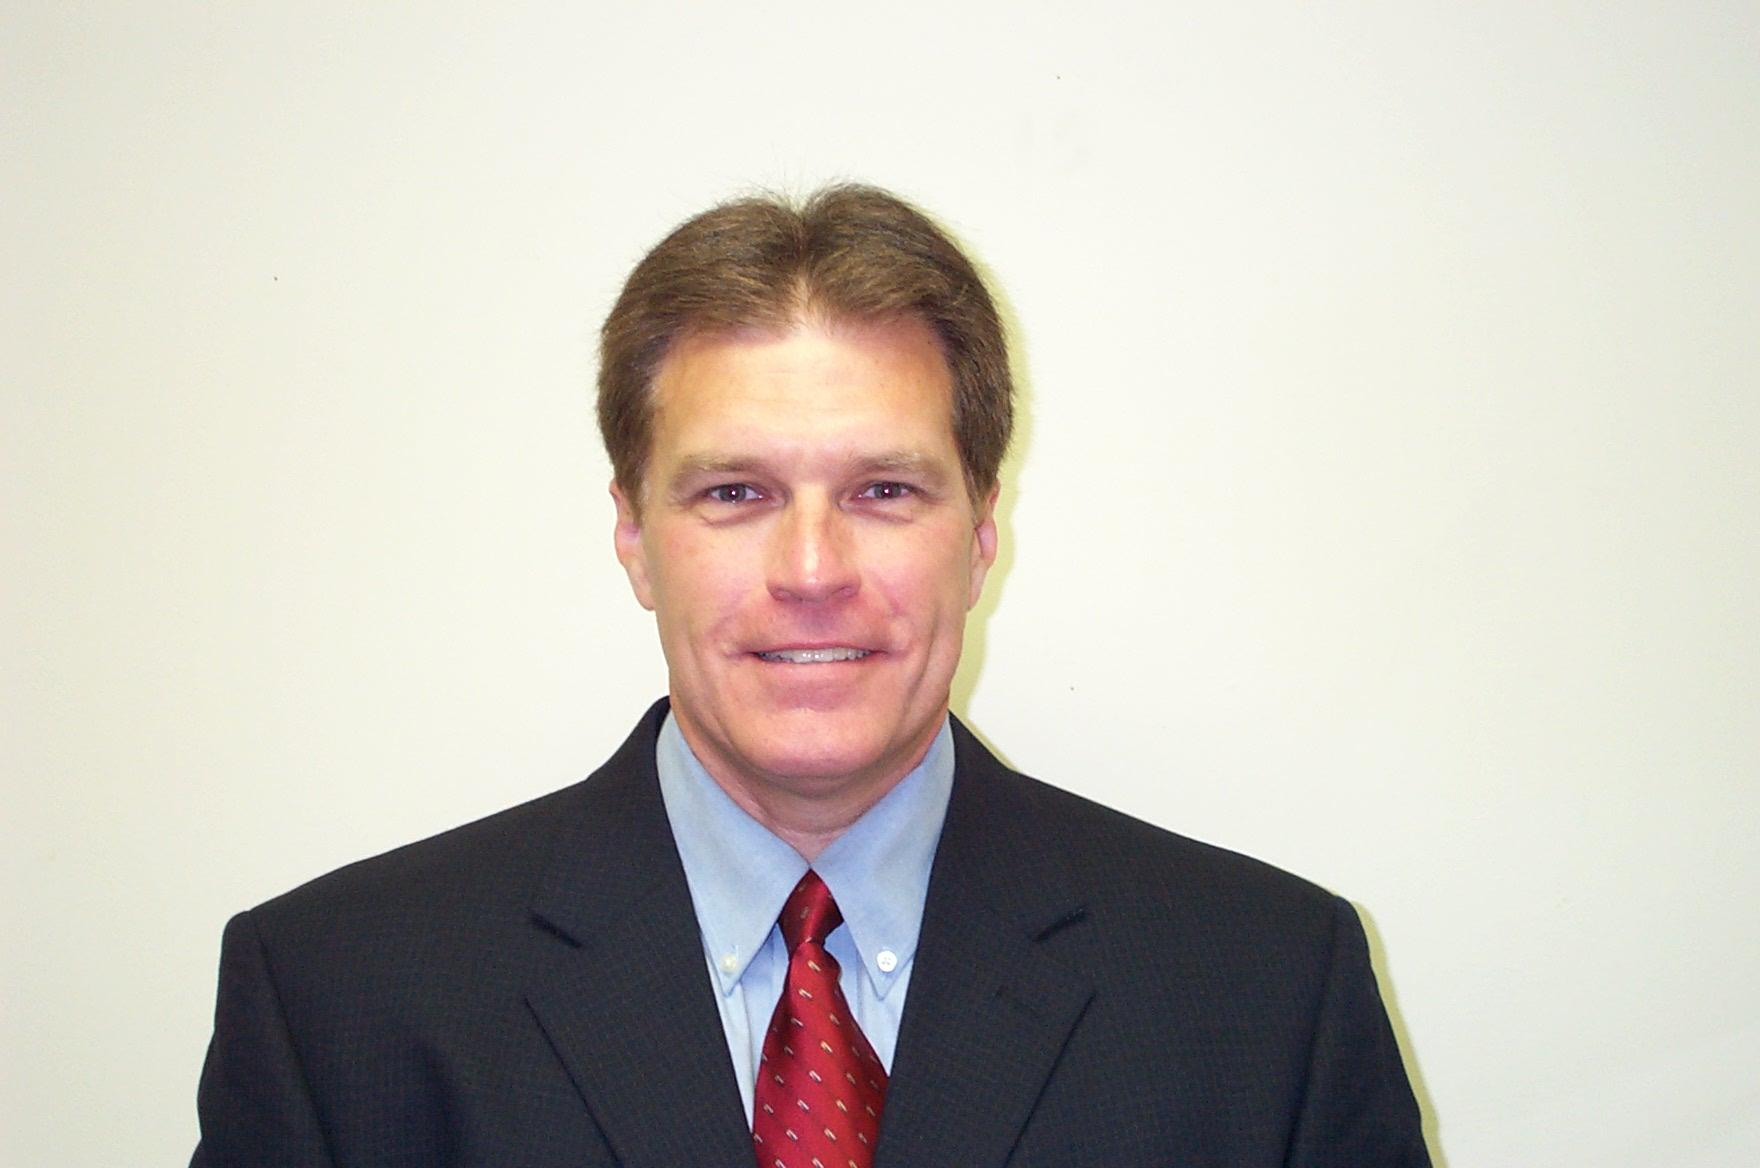 David Van Horn, financial advisor Raleigh NC